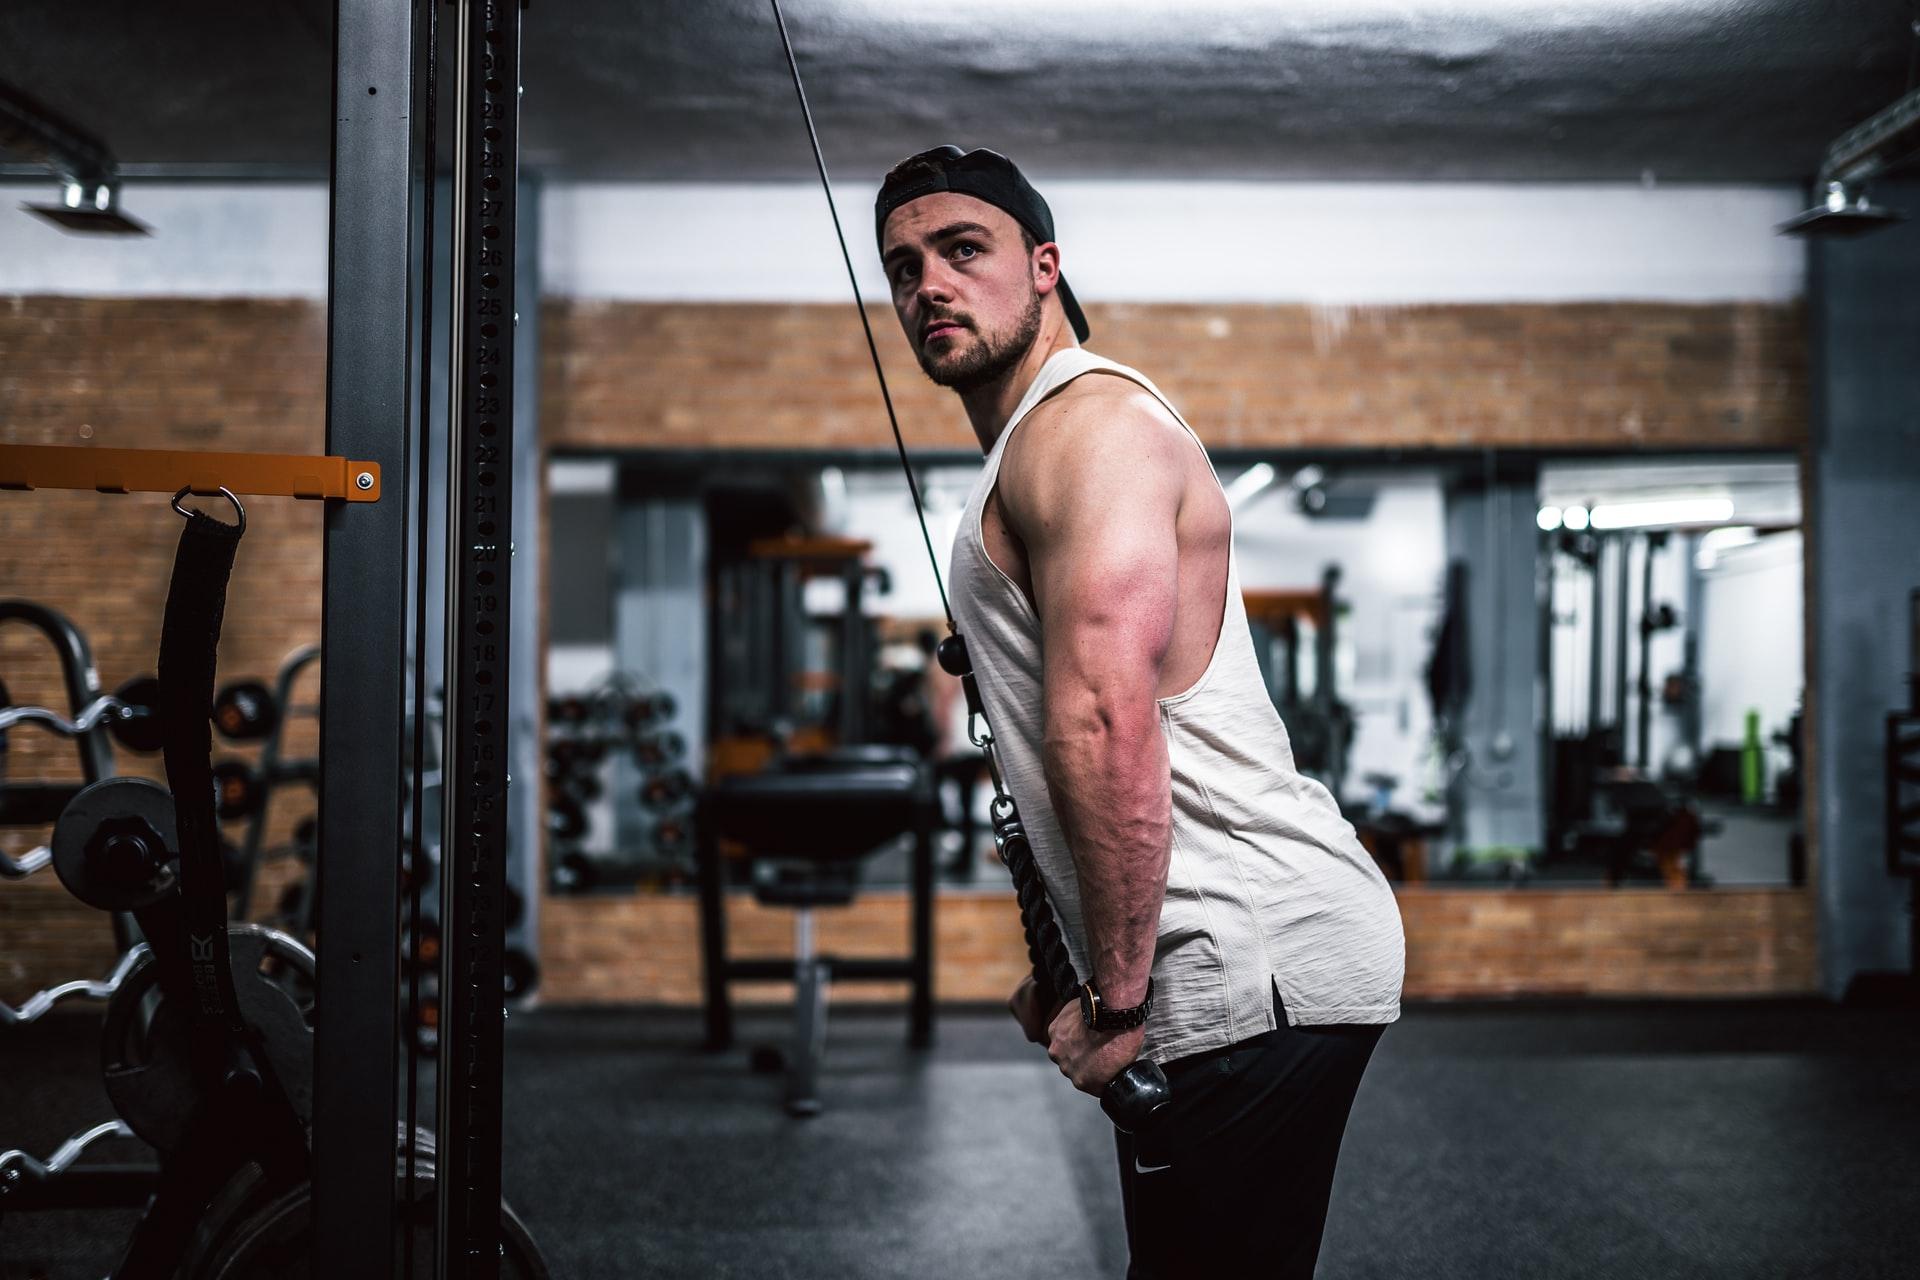 Stretching & Beginner Workout